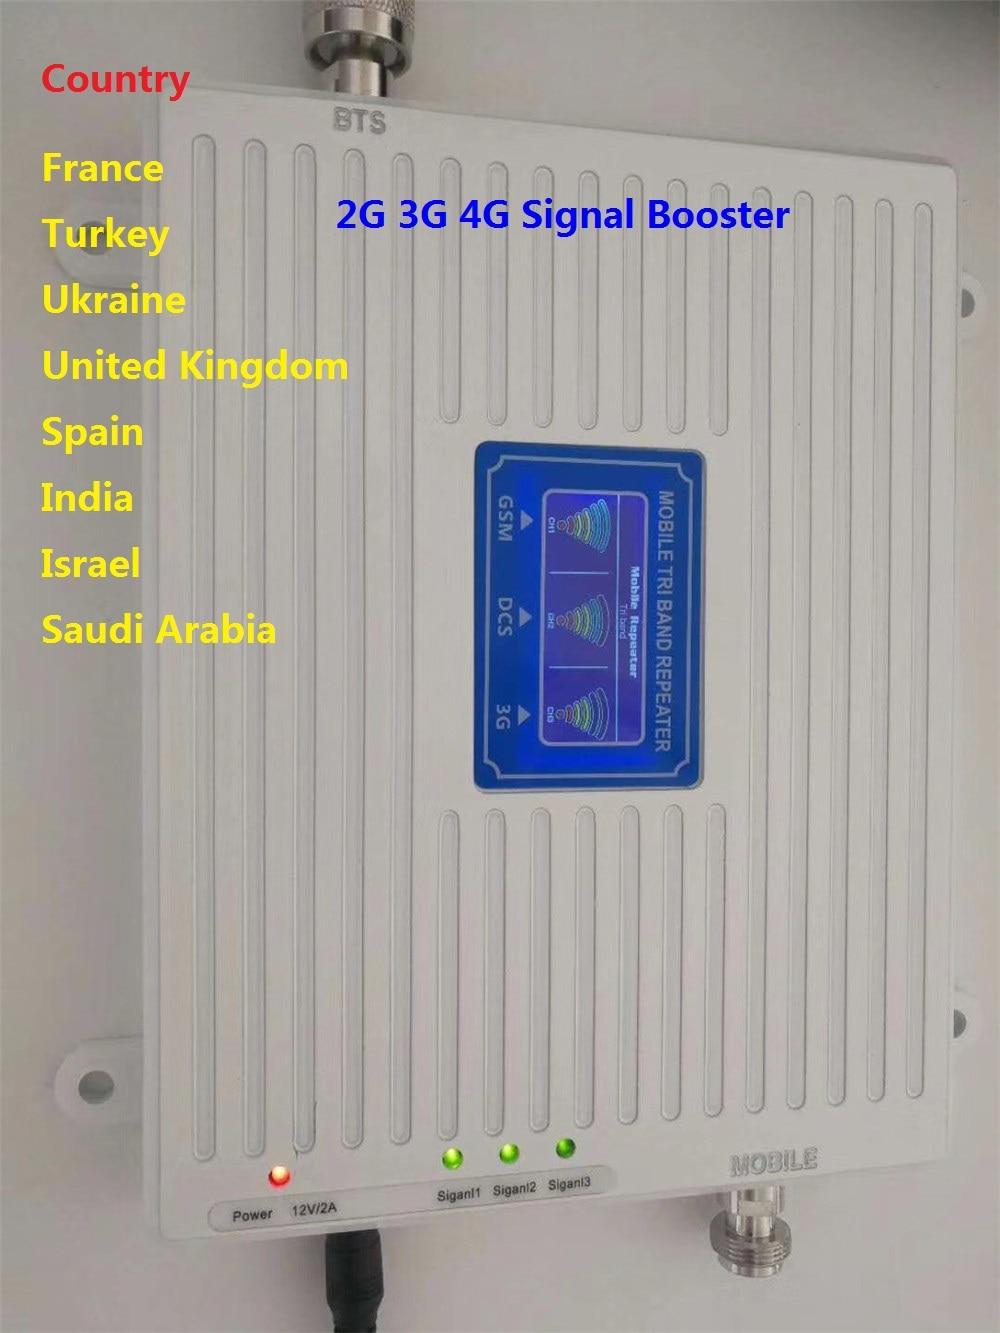 LTE 1800 mhz Amplificador de sinal GSM 900 mhz UMTS 2100 mhz 4 3 2g g g Tri Band Mobile cell Phone Signal Booster móvel Repetidor de sinal